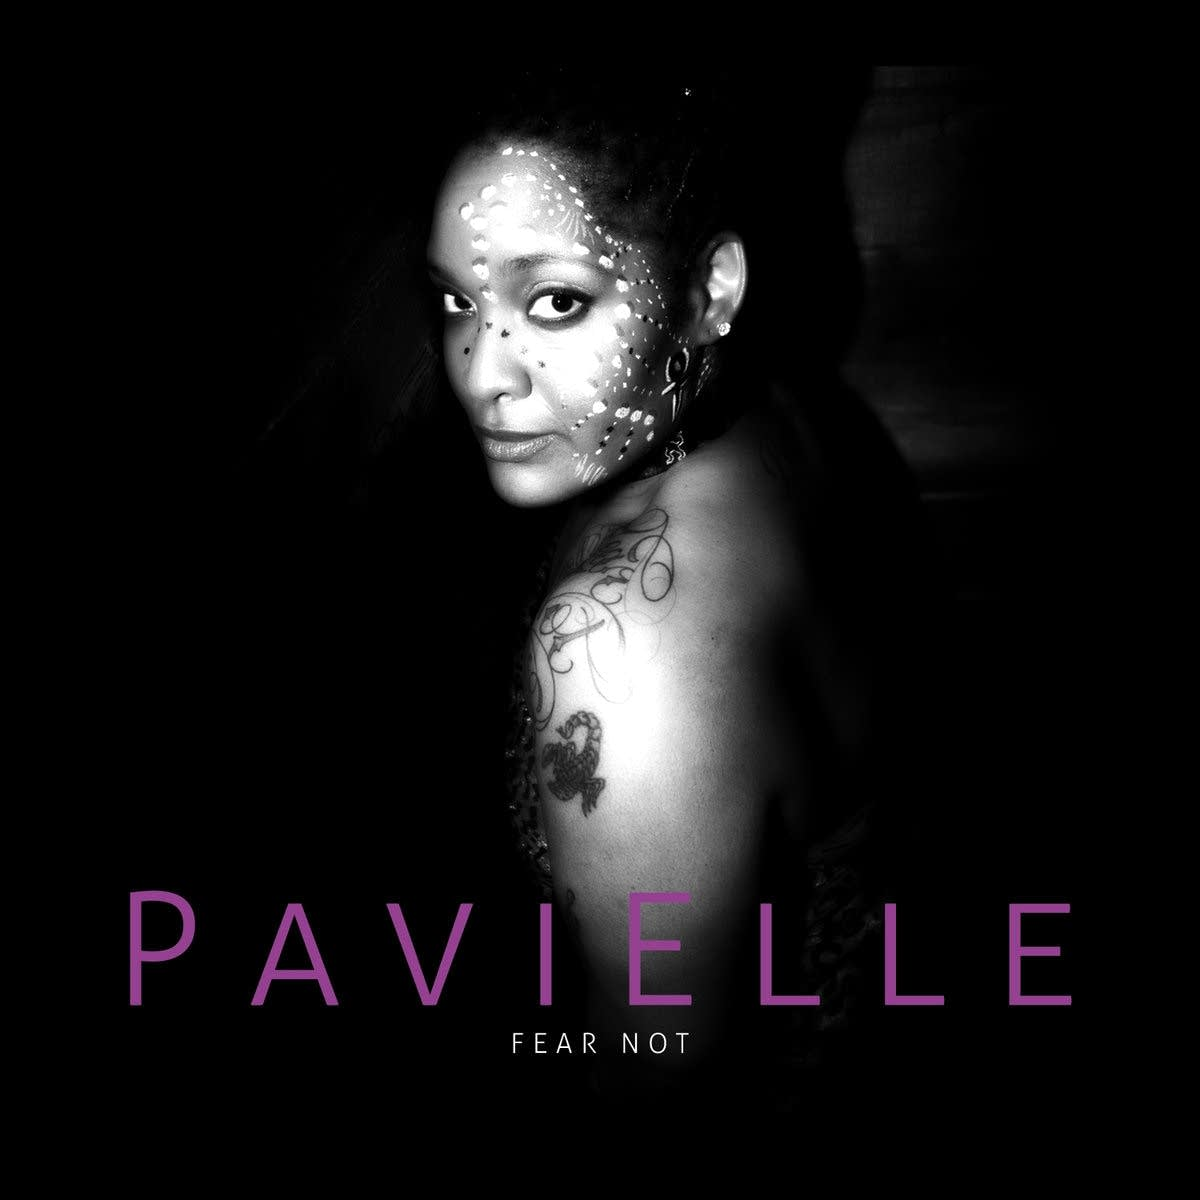 PaviElle